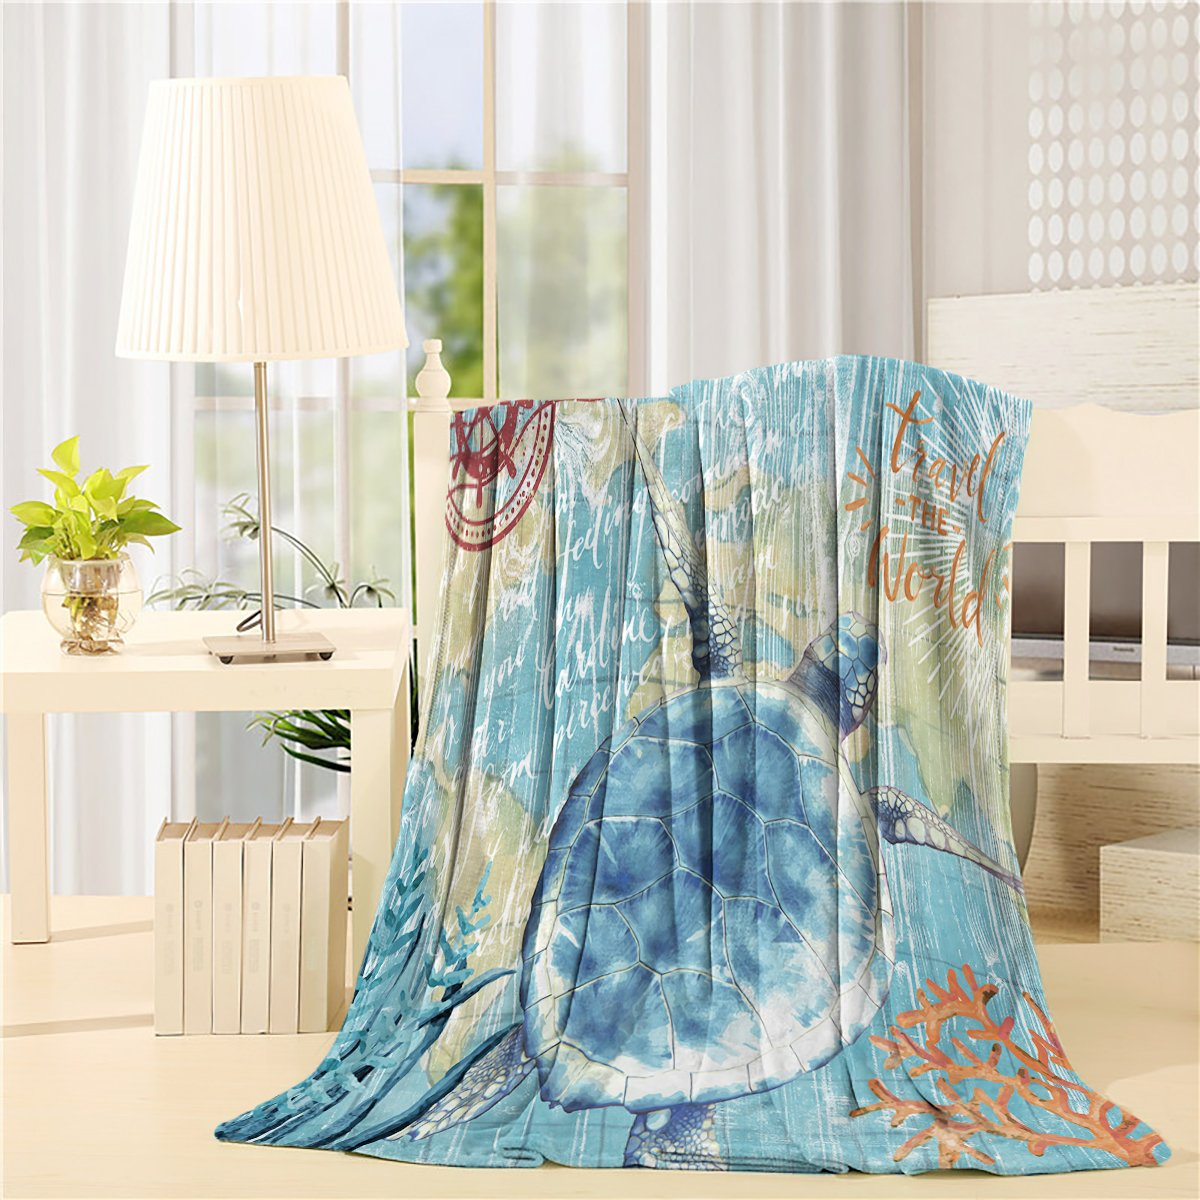 SUN-Shine Luxury Throw Blanket Soft Flannel Fleece Lightweight Cozy Plush Microfiber Blankets Sofa Couch Bed-Custom Design Sea Turtle Ocean Animal Watercolor